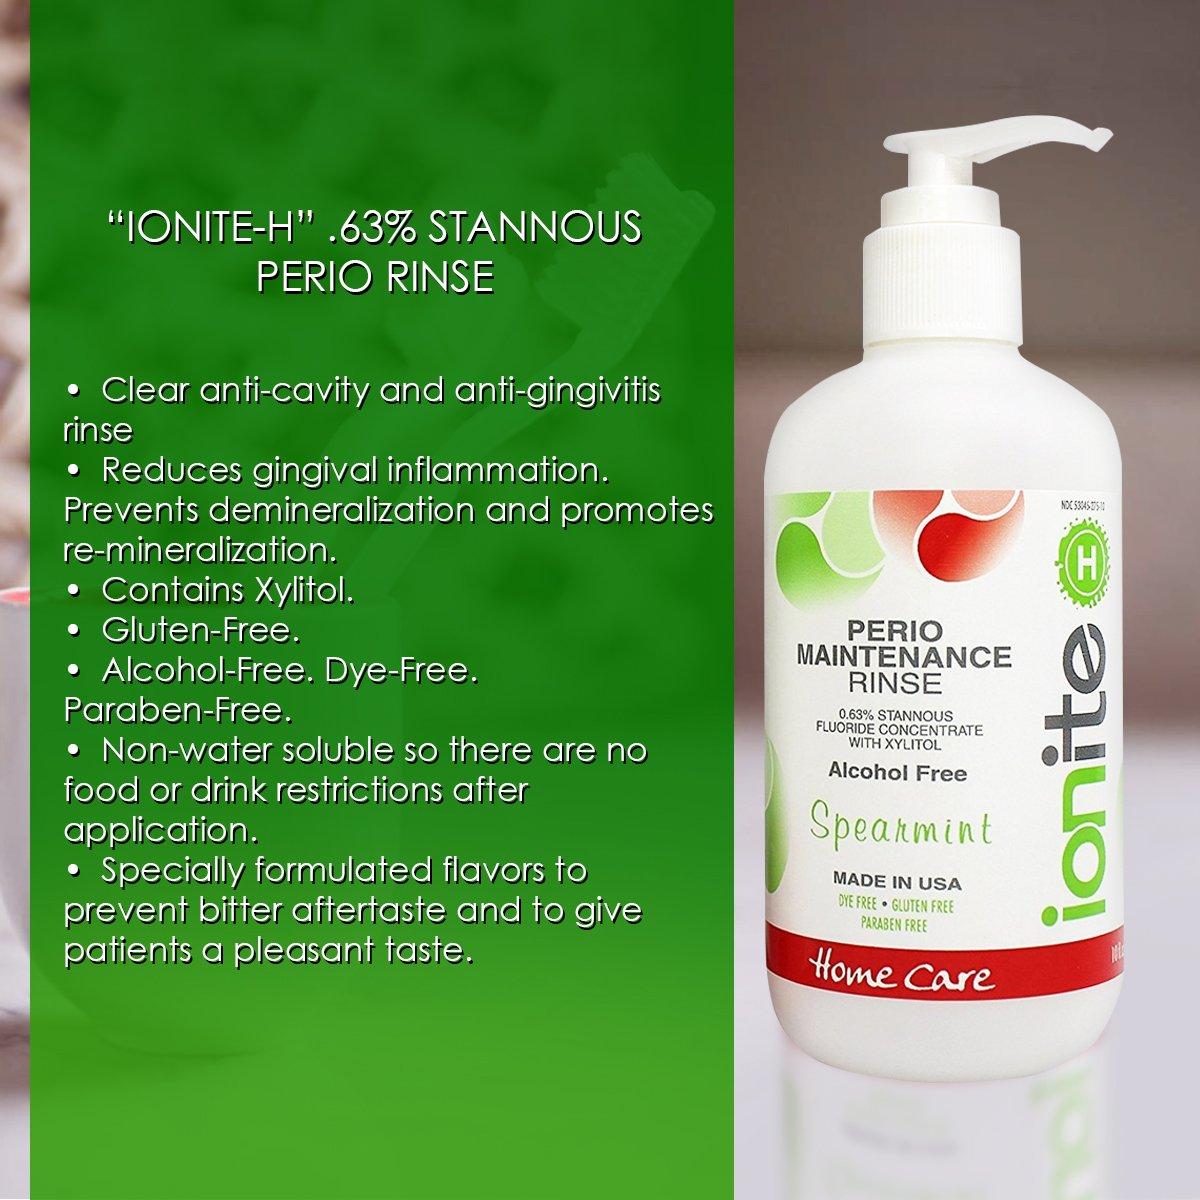 Amazon.com: Ionite 0.63% Stannous Fluoride Antimicrobial Perio Rinse  Mouthwash - Spearmint Flavor 10 Fl. Oz.: Industrial & Scientific